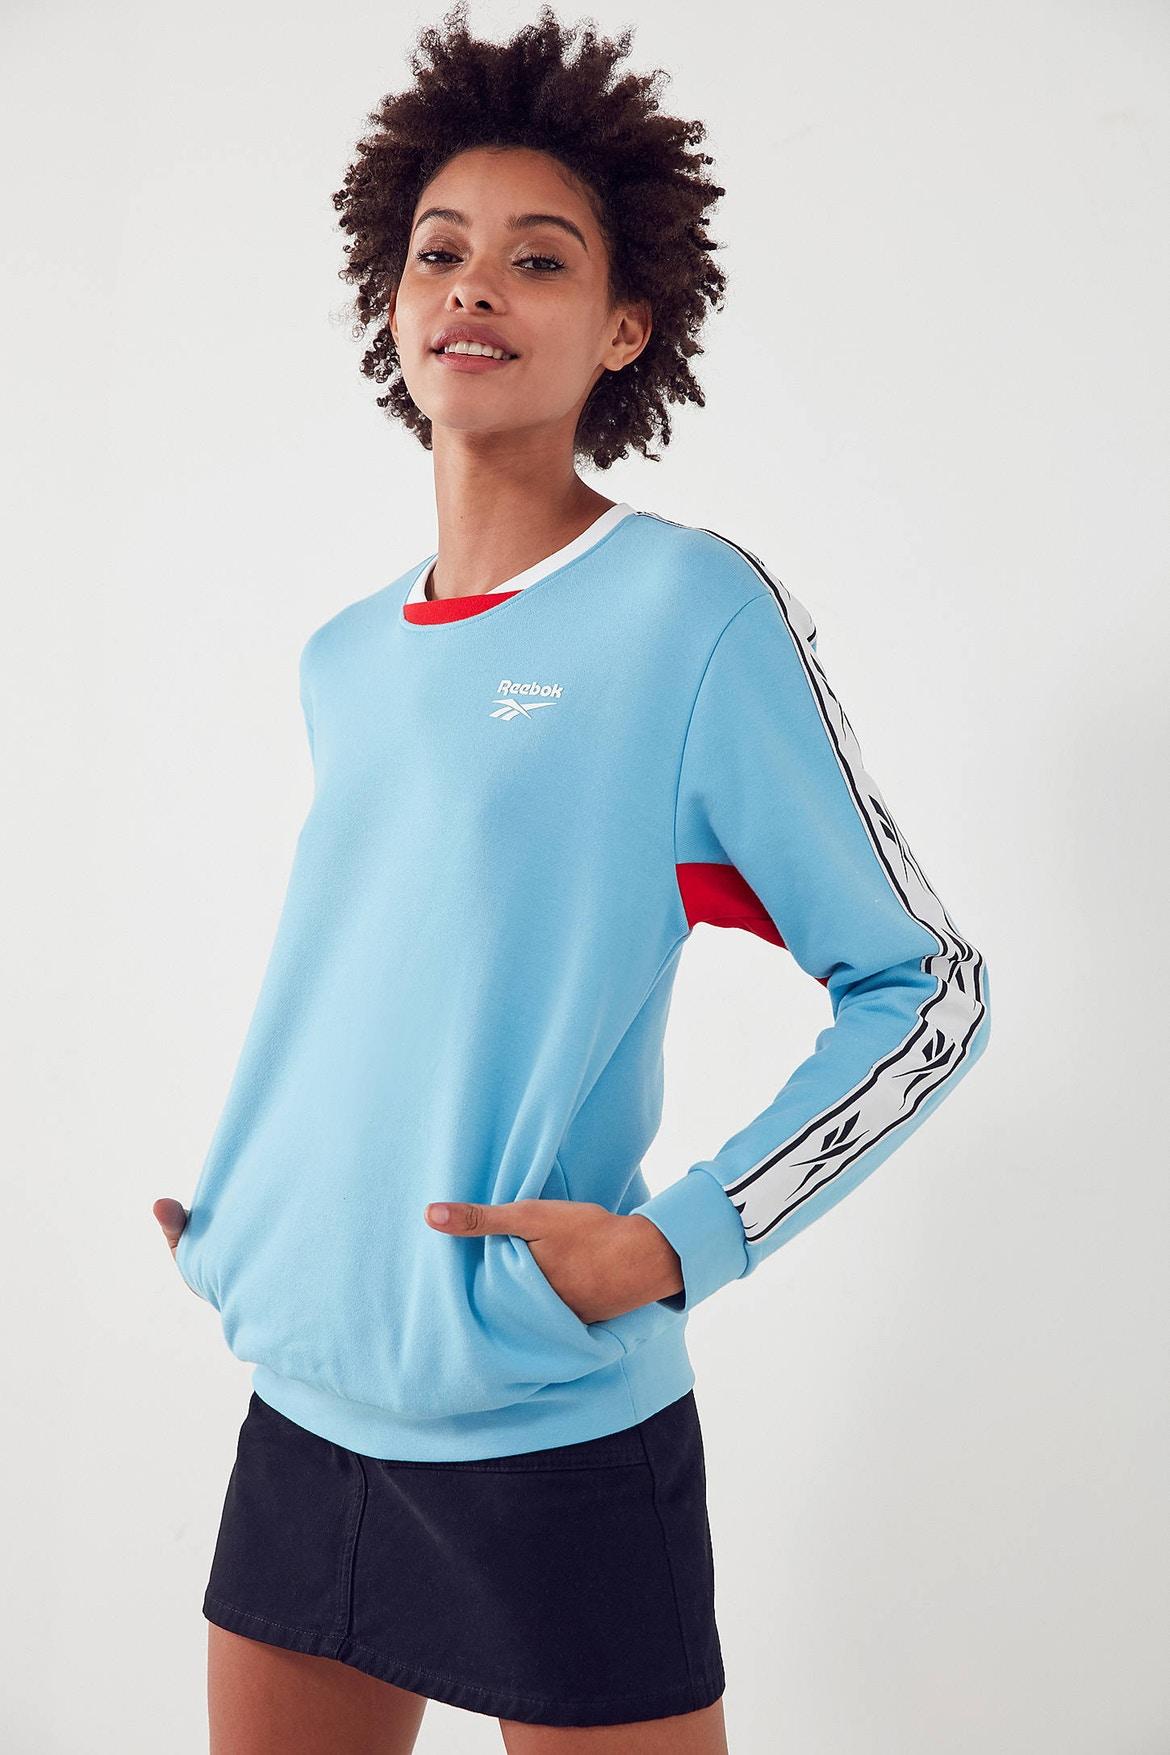 http-bae.hypebeast.comfiles201707reebok-urban-outfitters-vector-sweatshirt-blue-2